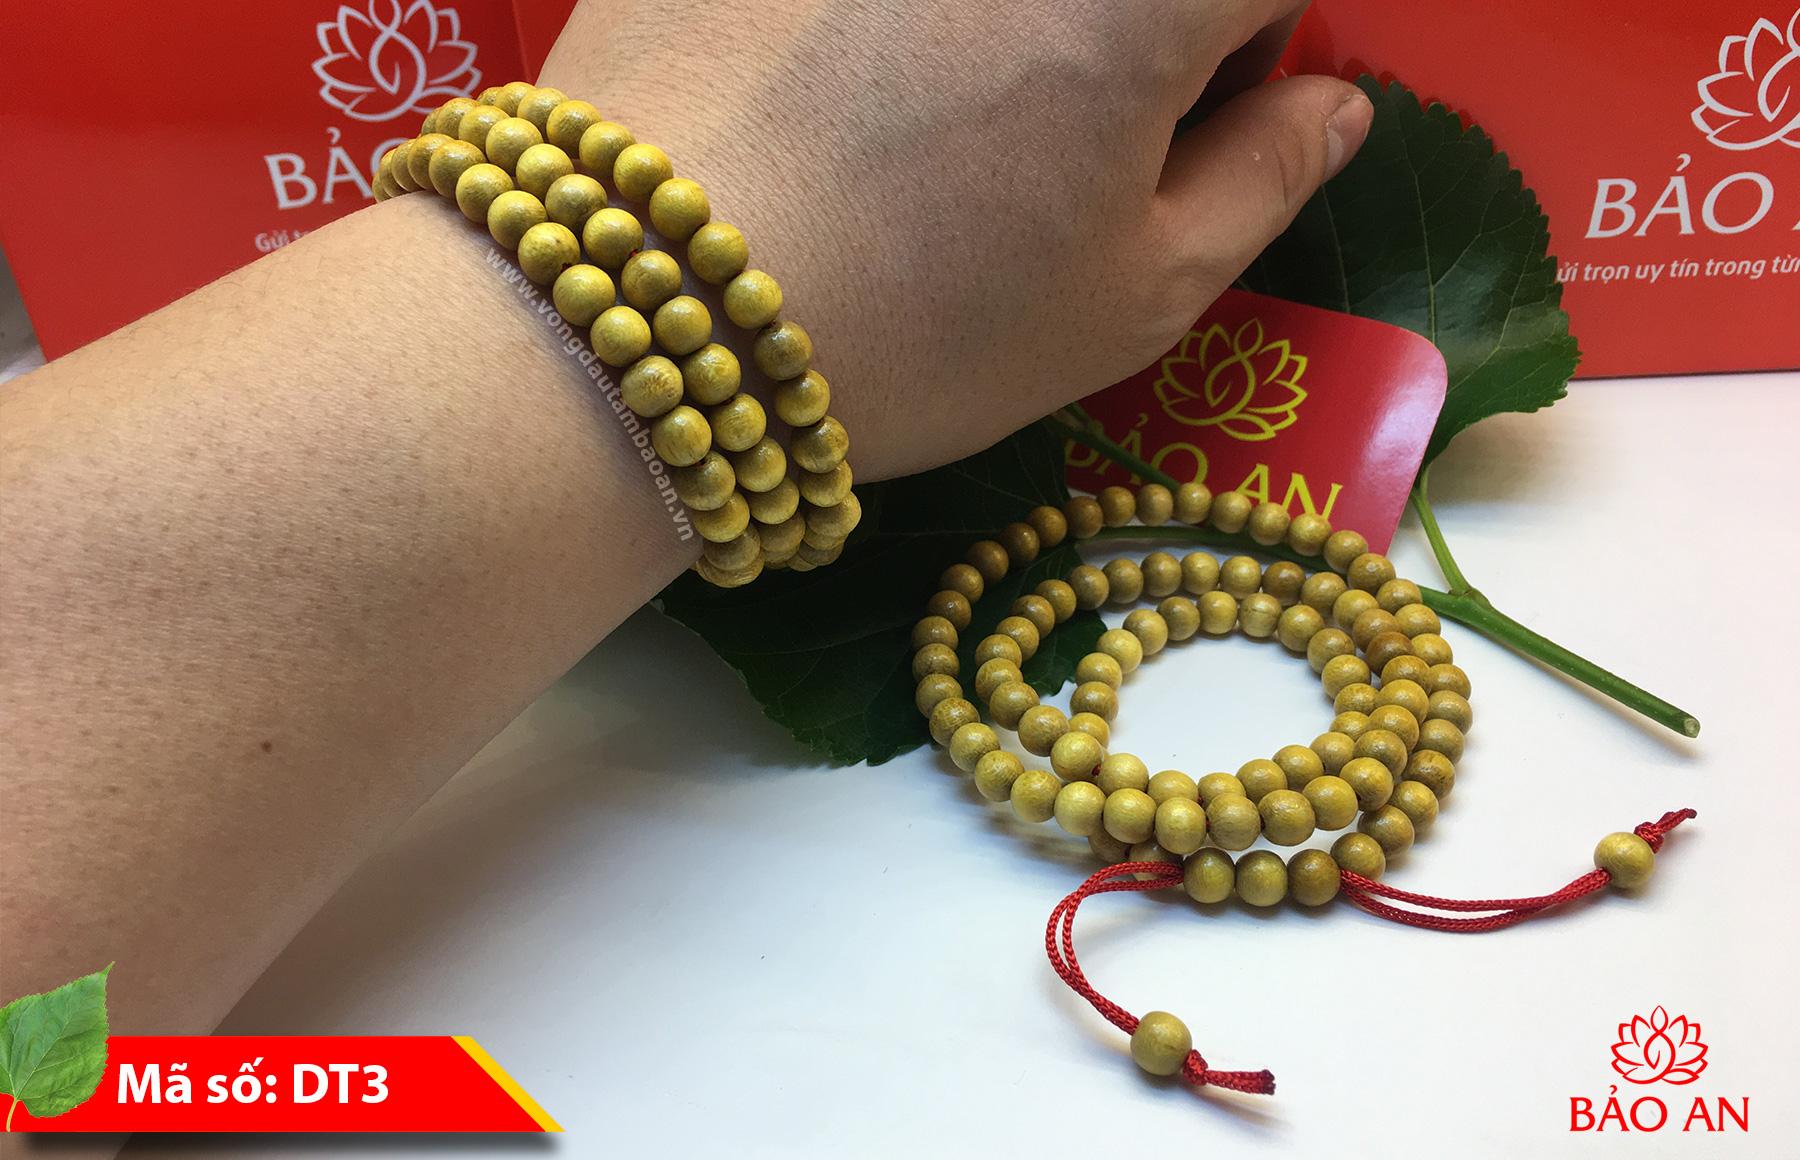 vongdautambaoan-DT3-C